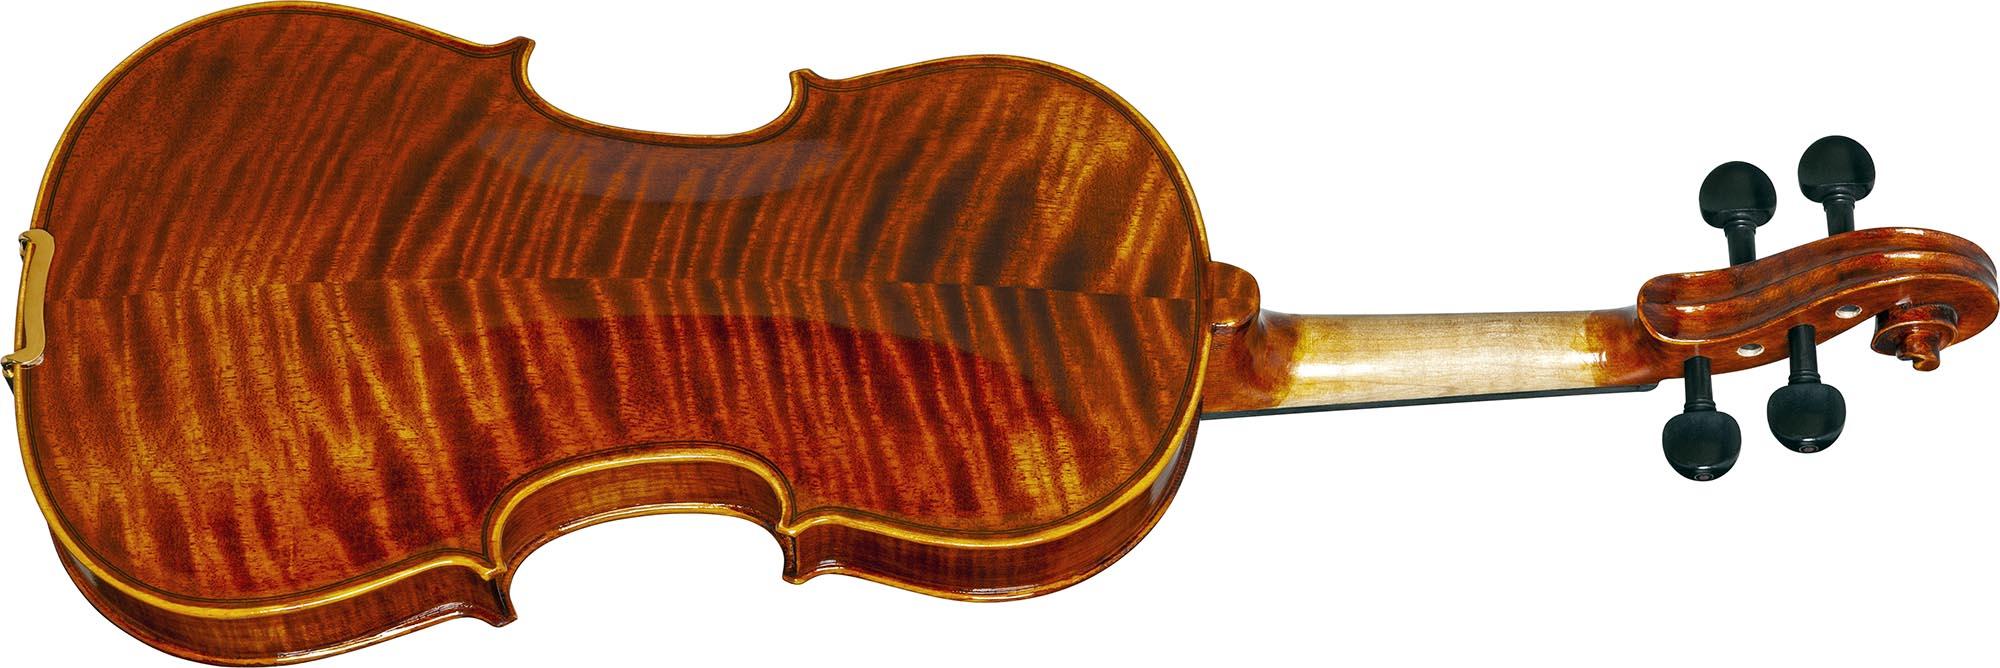 vk644 violino eagle vk644 visao posterior